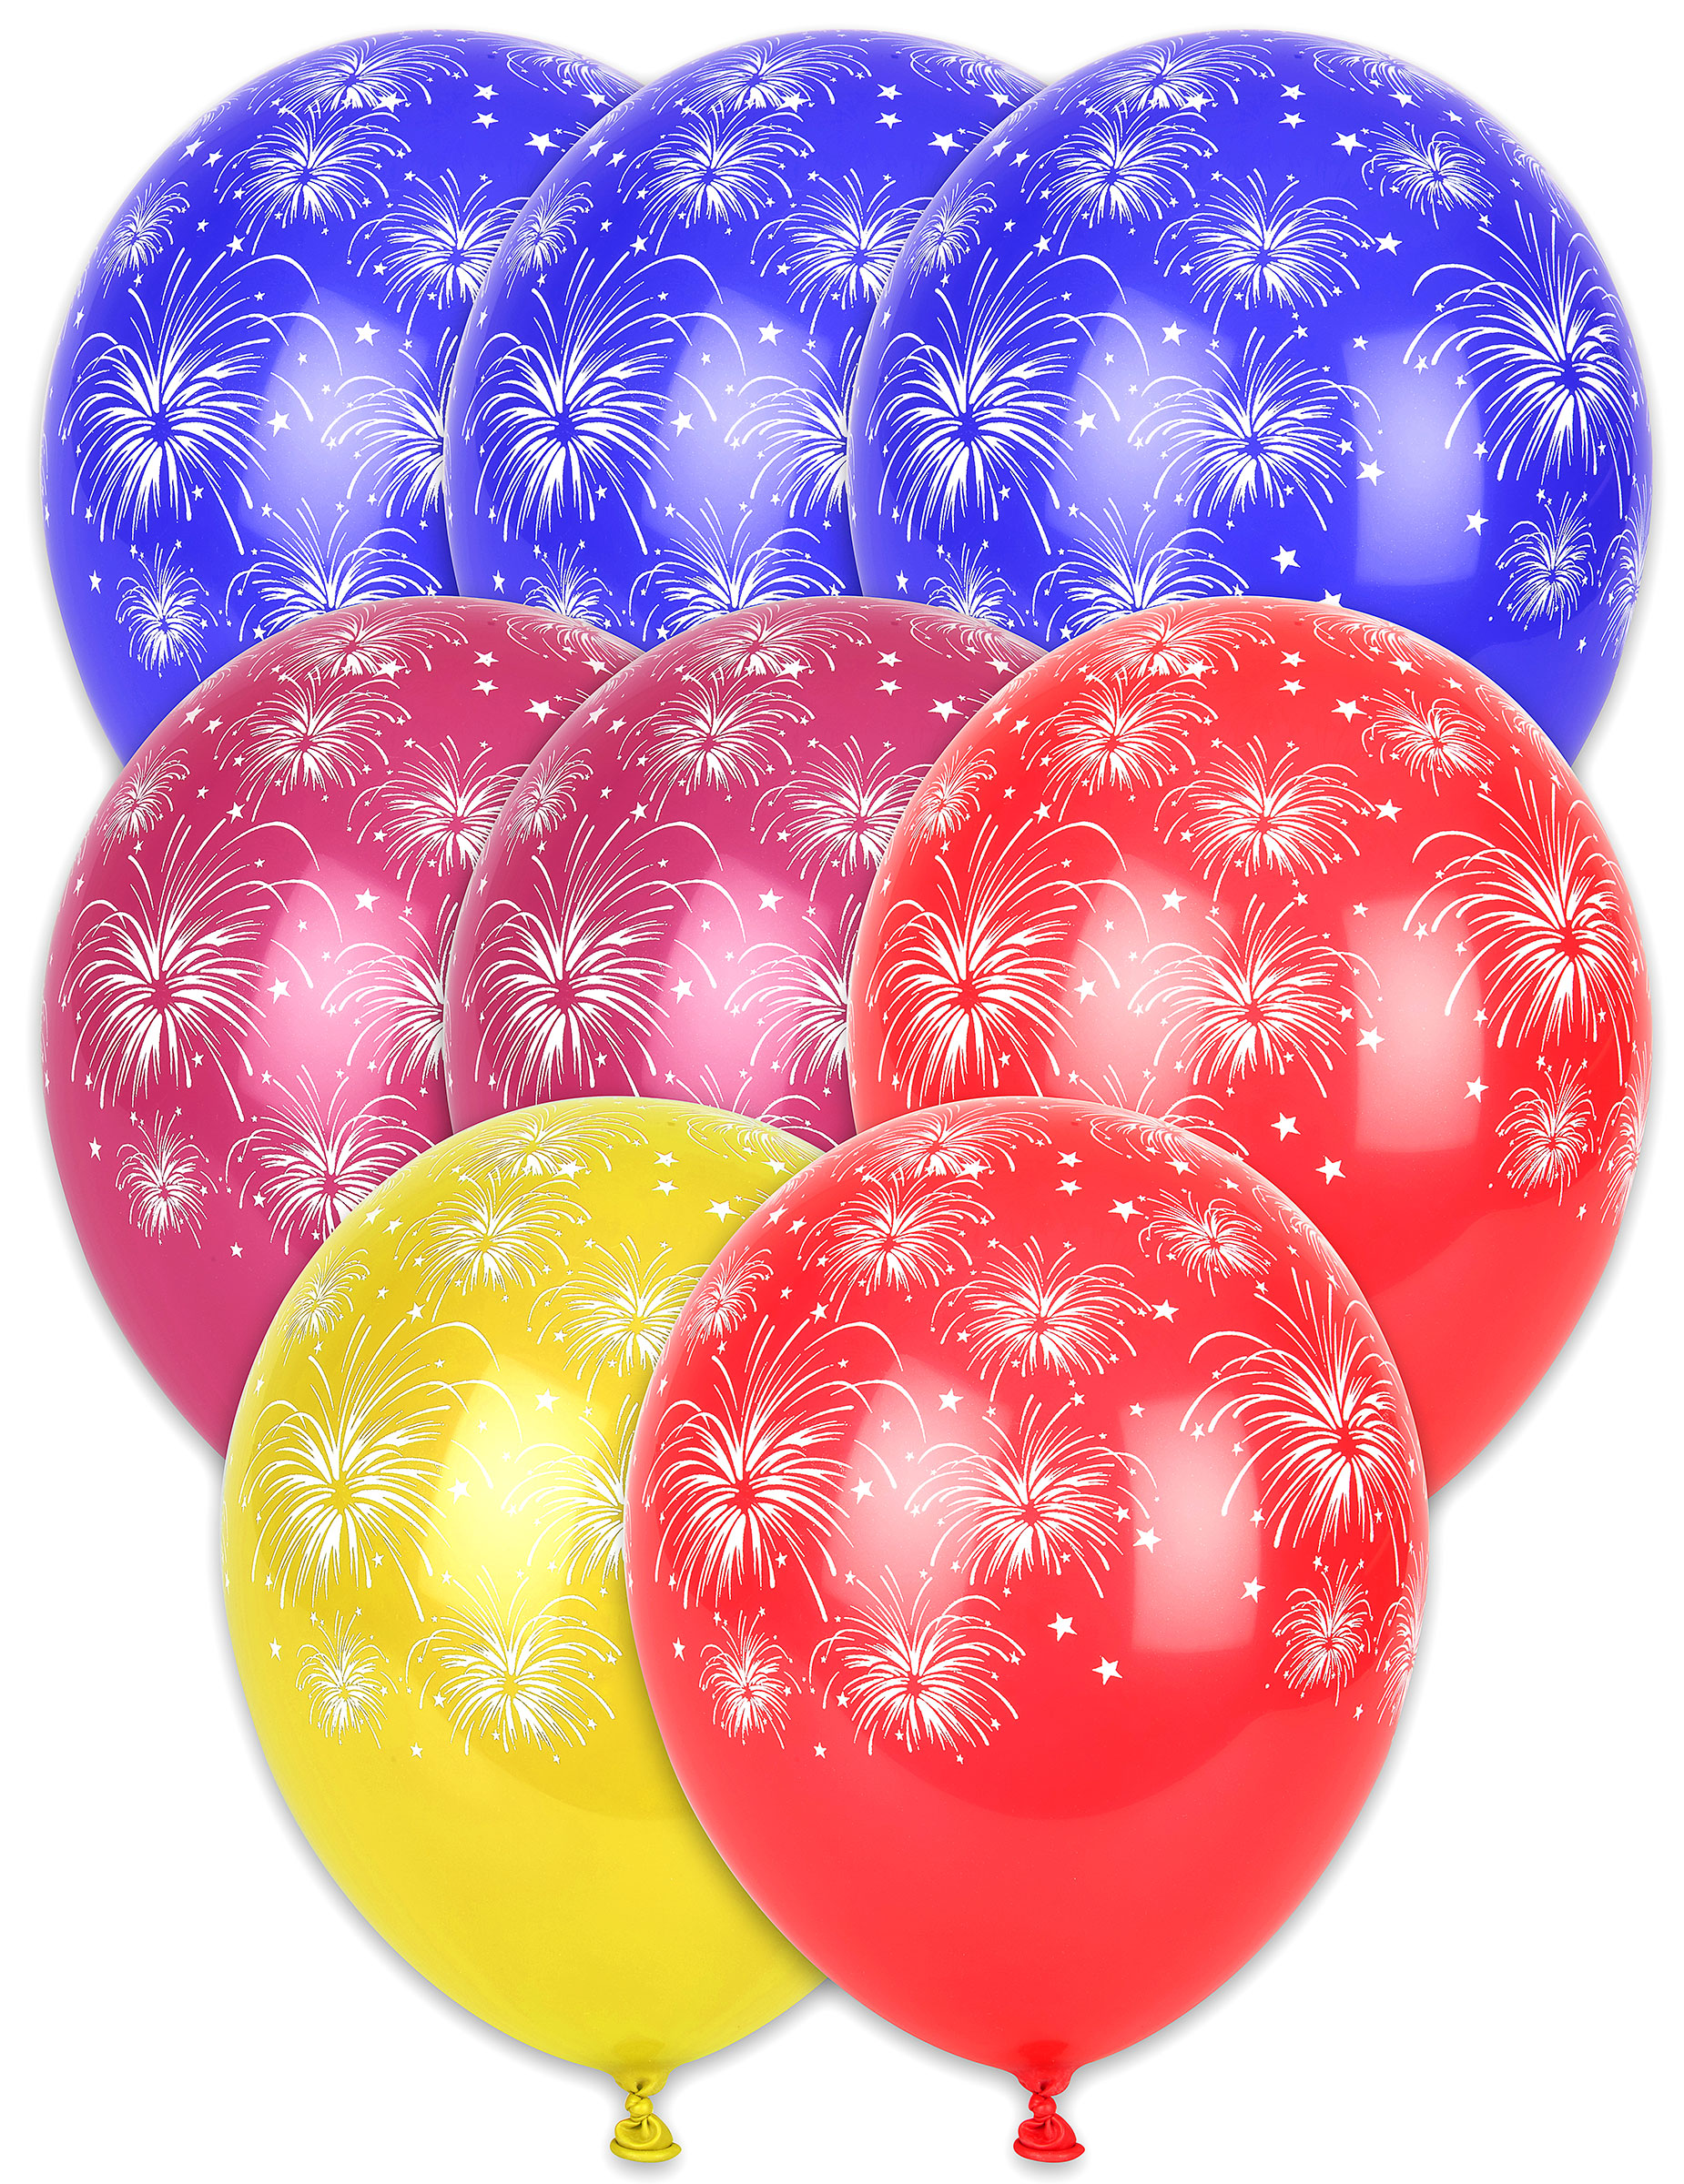 Silvester party dekoration luftballons mit feuerwerk 8 for Dekoration mit luftballons